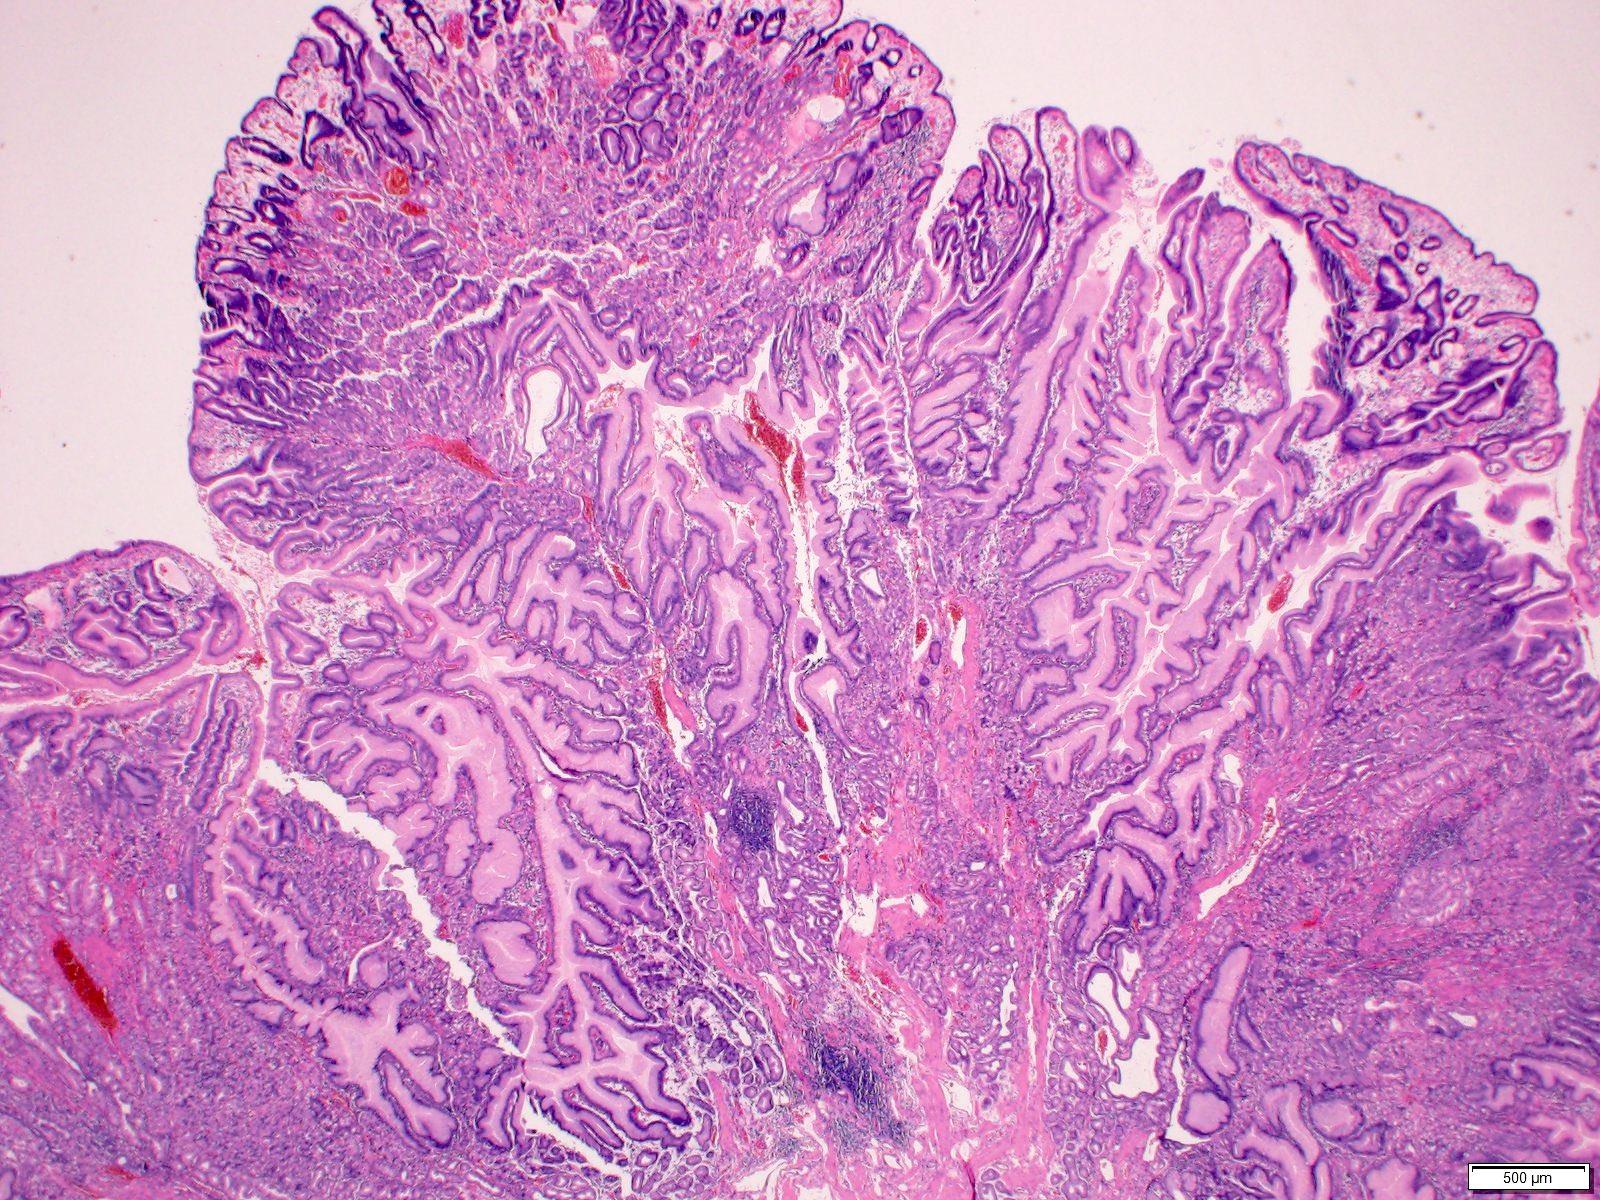 Ileal polypoid lesion